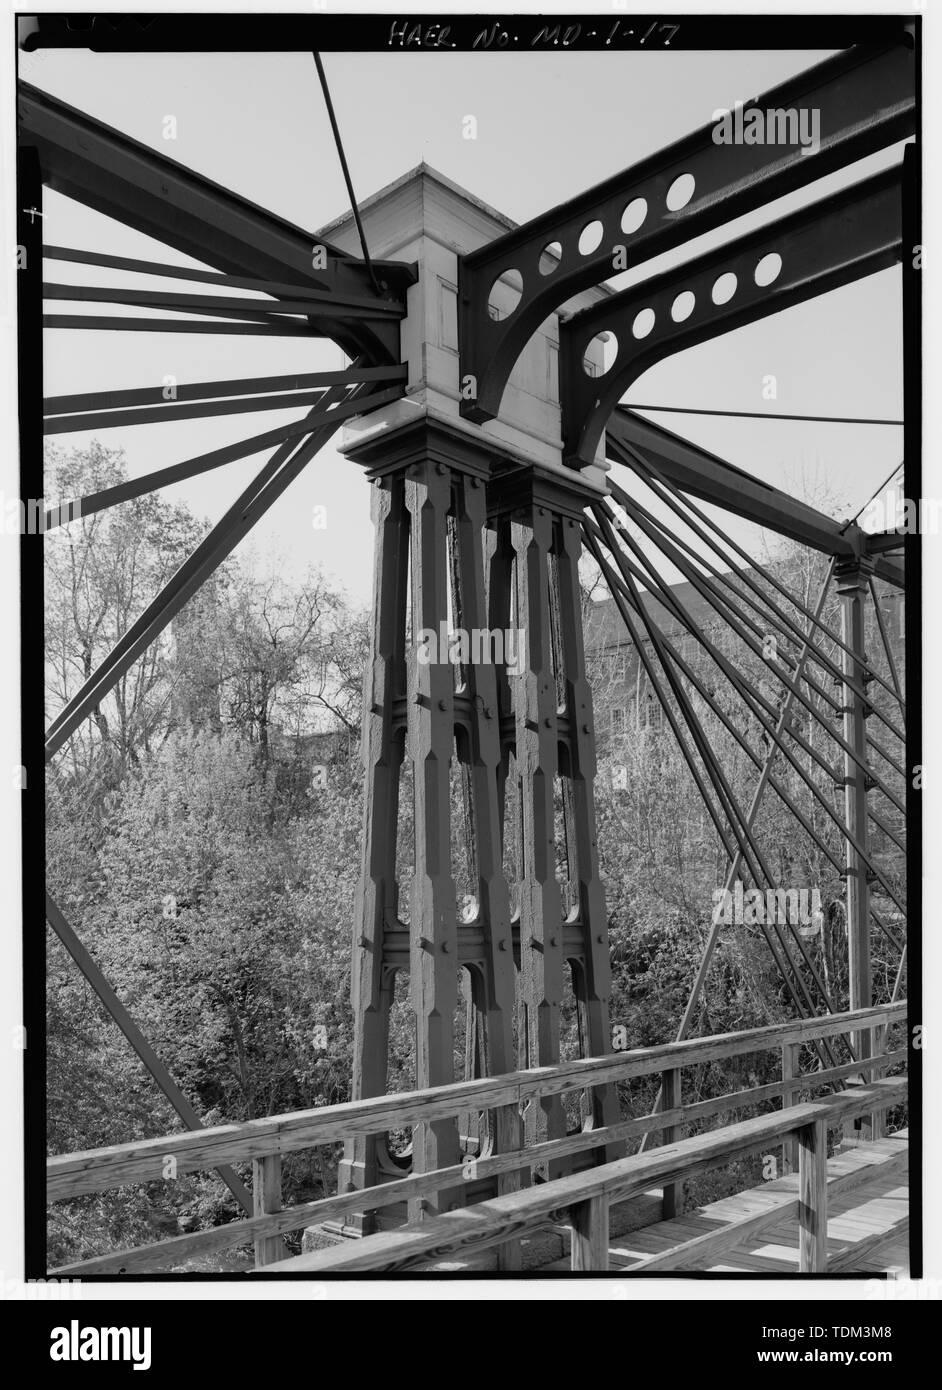 hight resolution of little river truss bridge stock photos little river truss bridge burr arch truss diagram penn central bridge savage bridge maryland